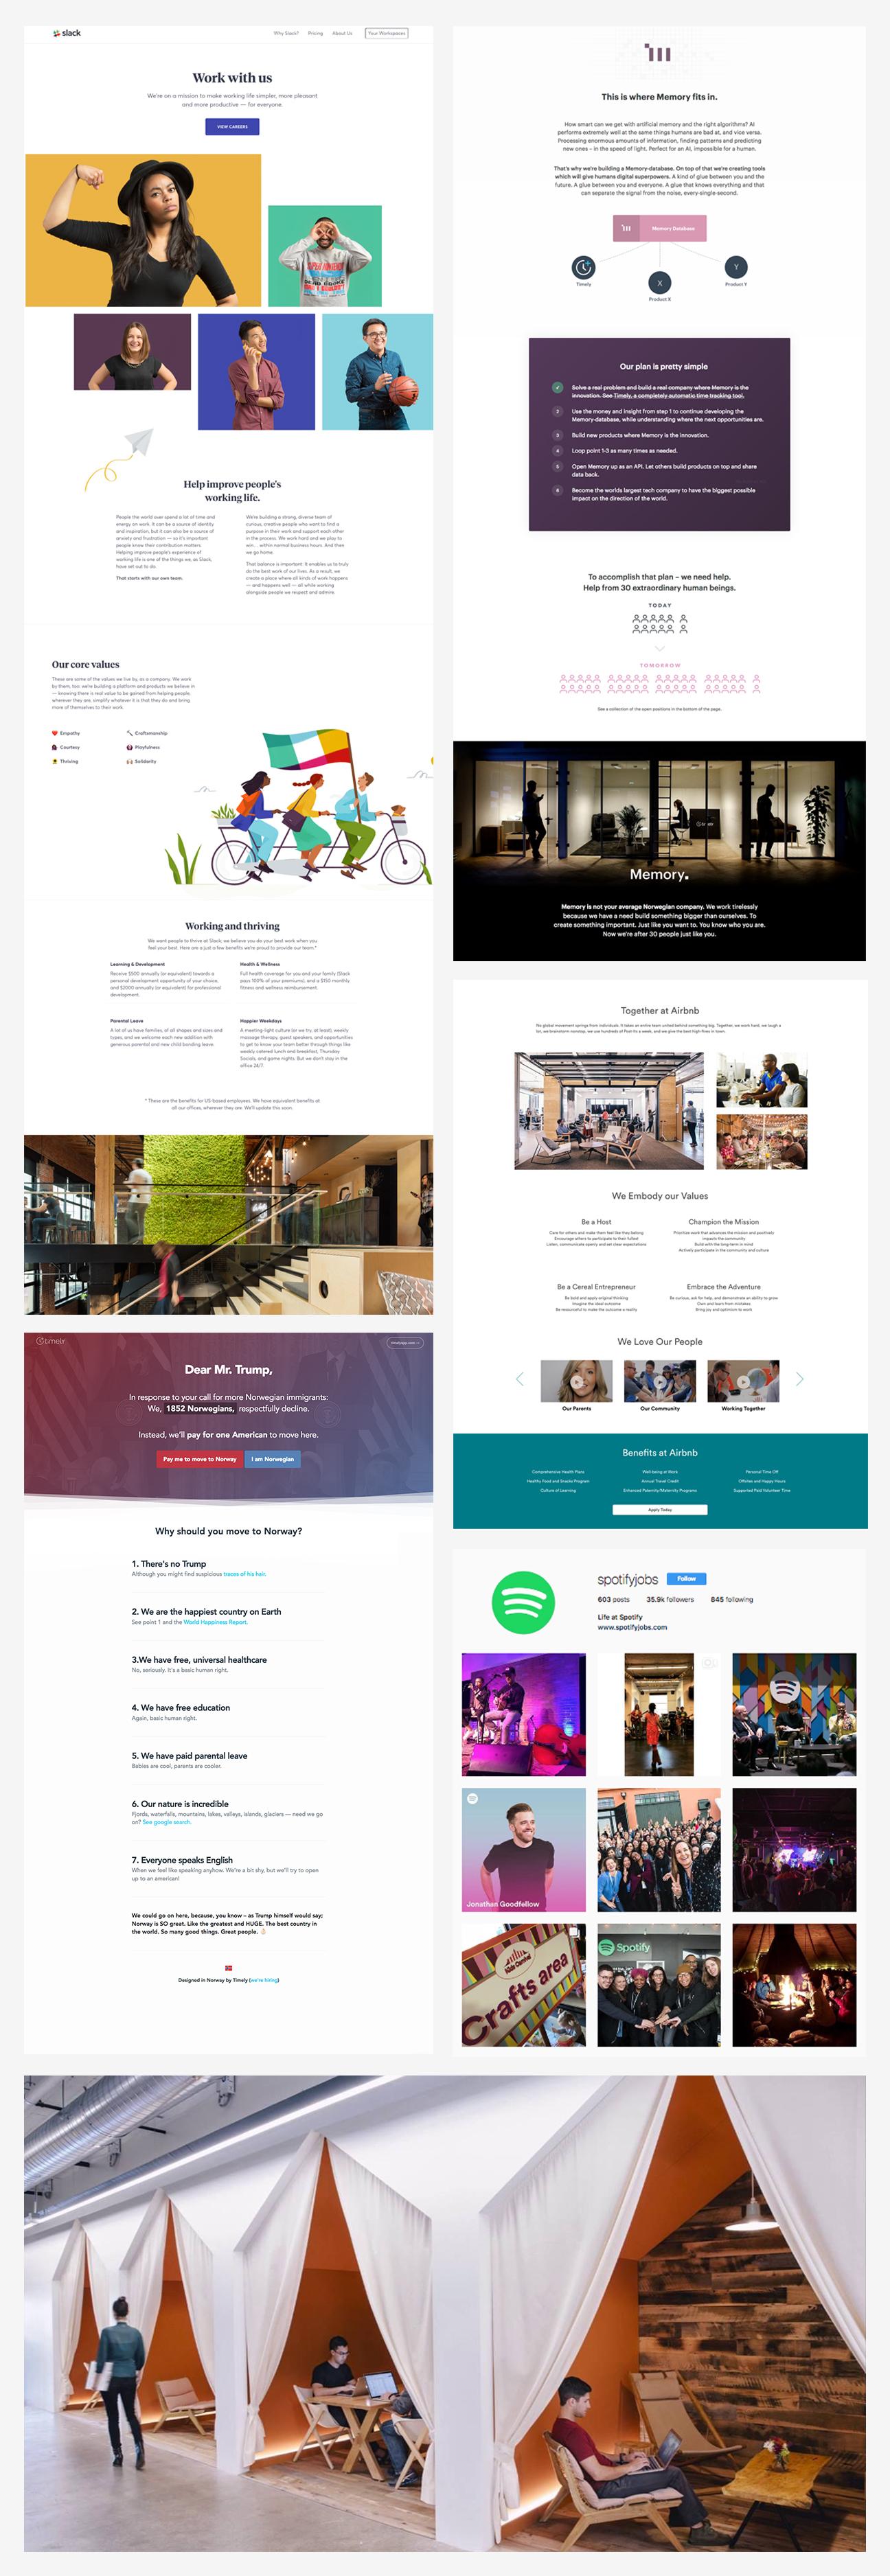 Identity Division Experience Customer Design Marketing to your Employees Staff Internally Internal Marketing Branding